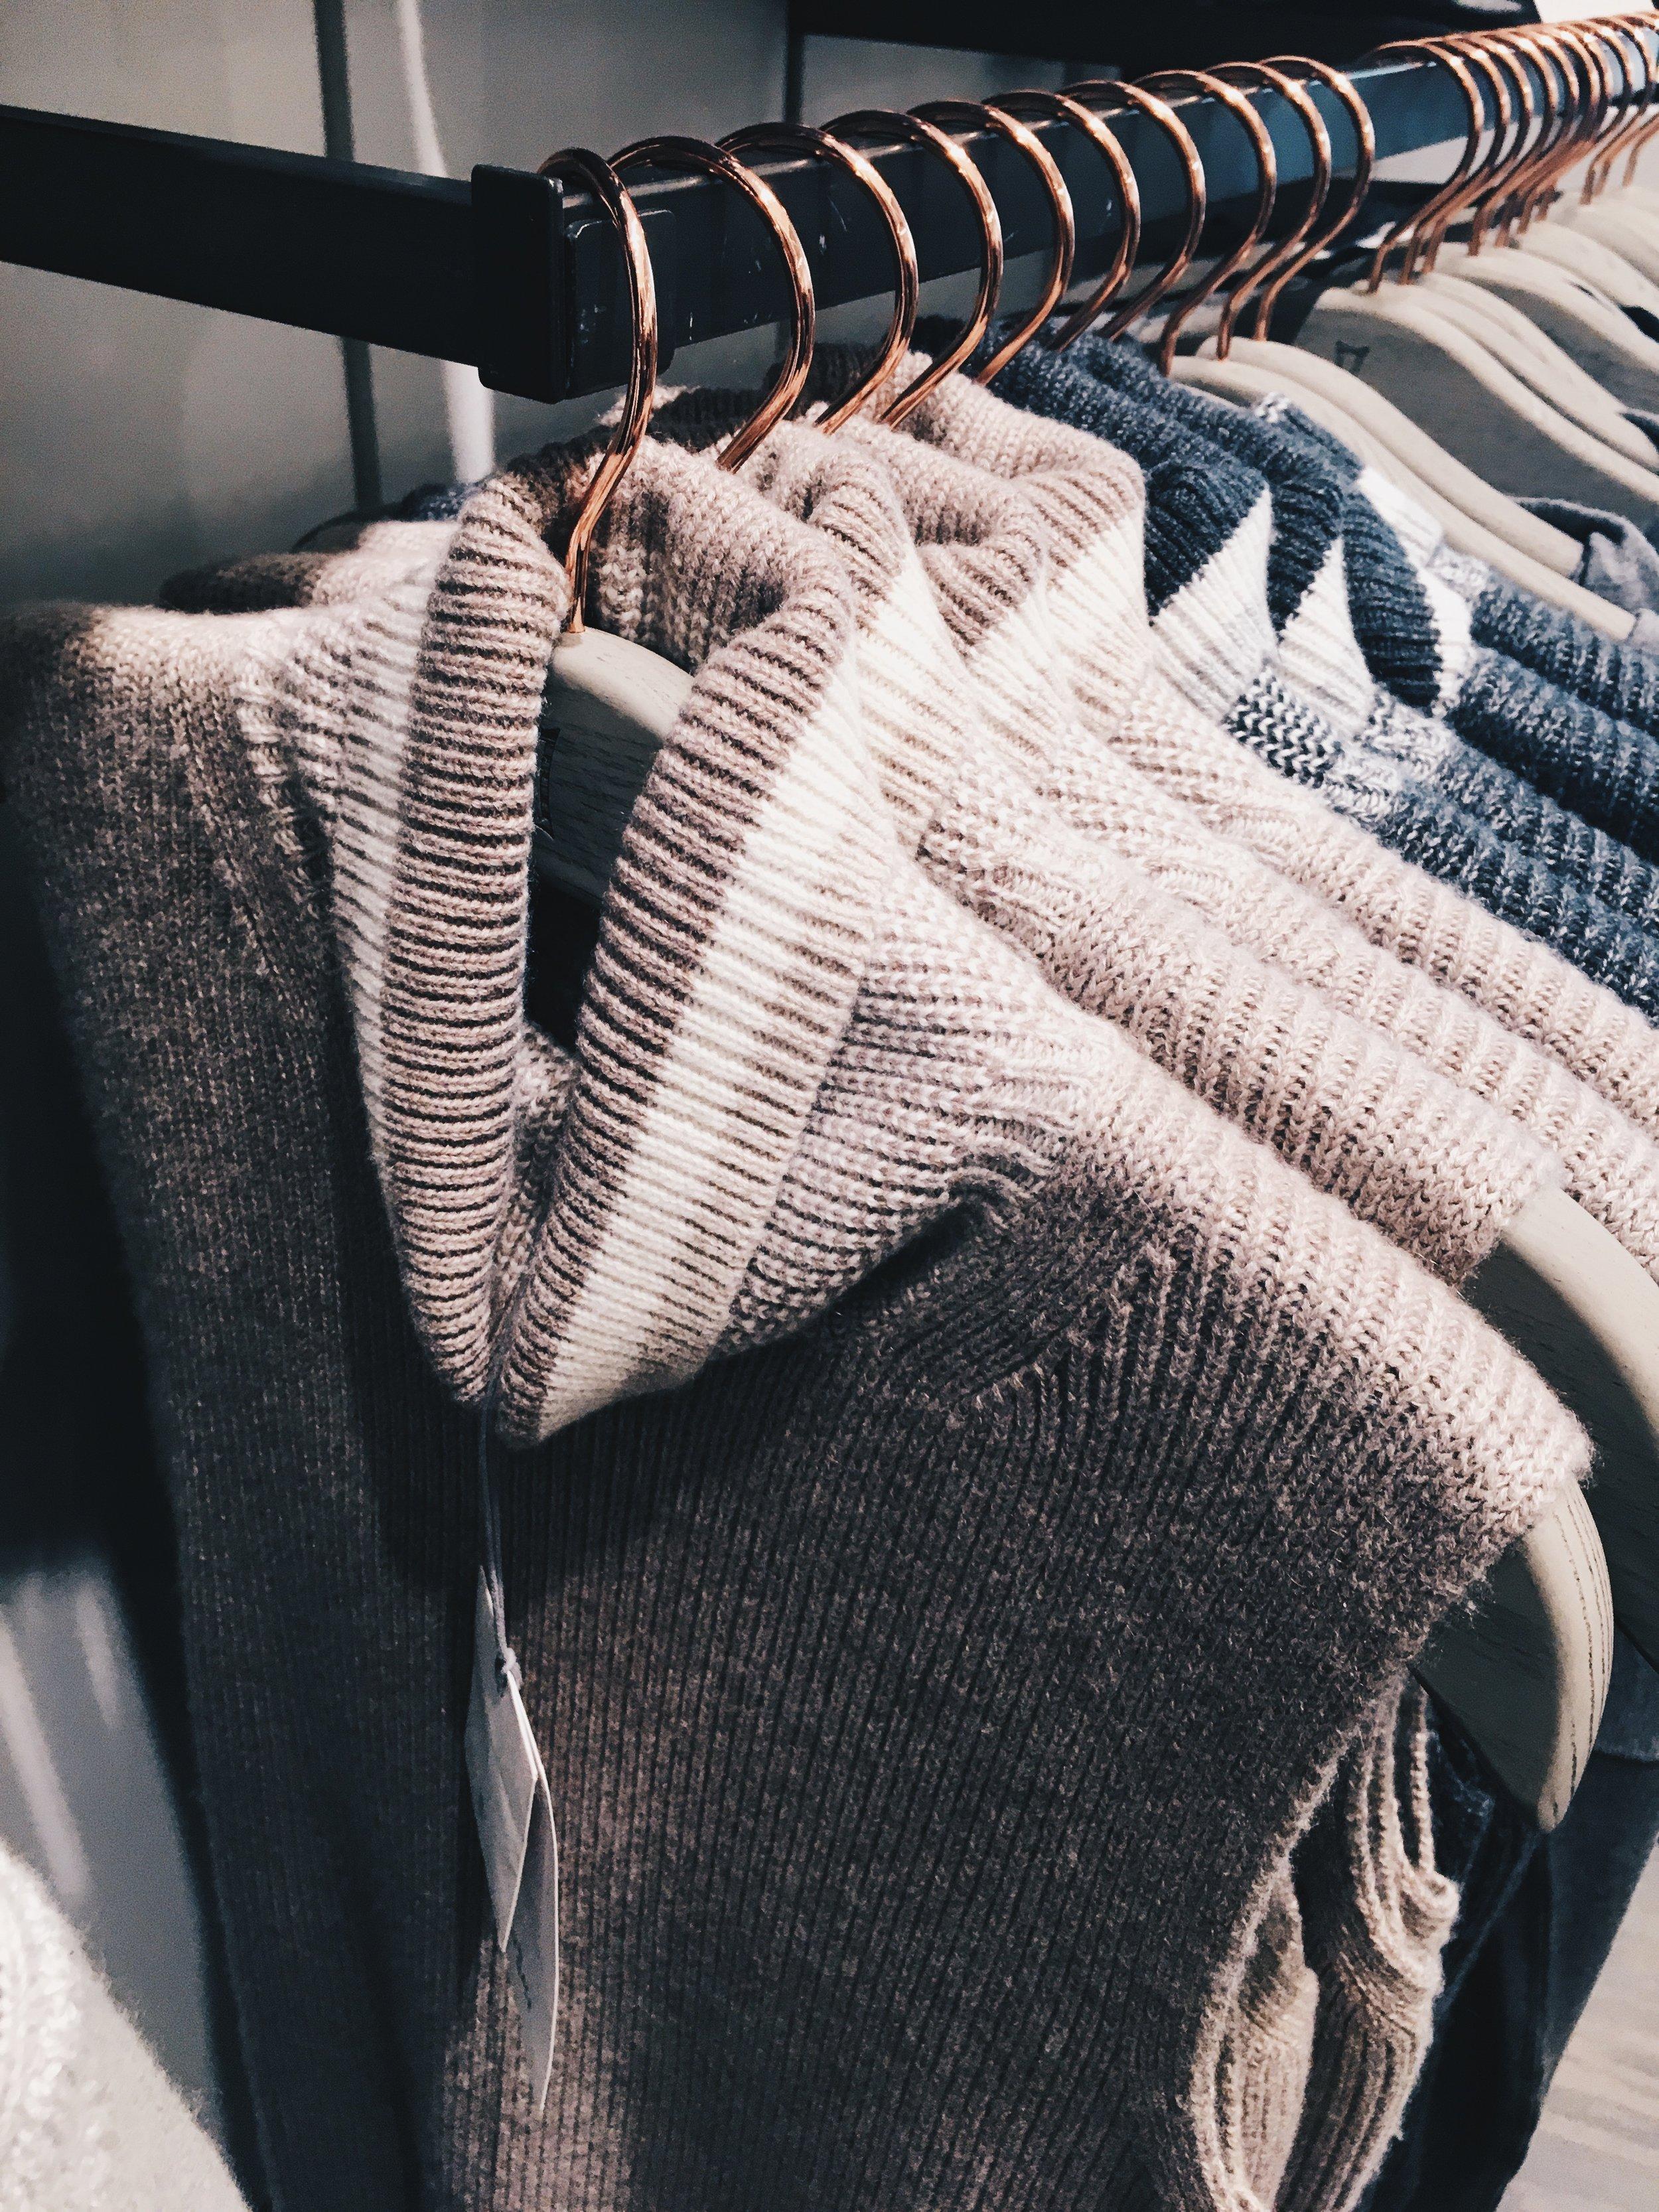 Rose Gold Hangers